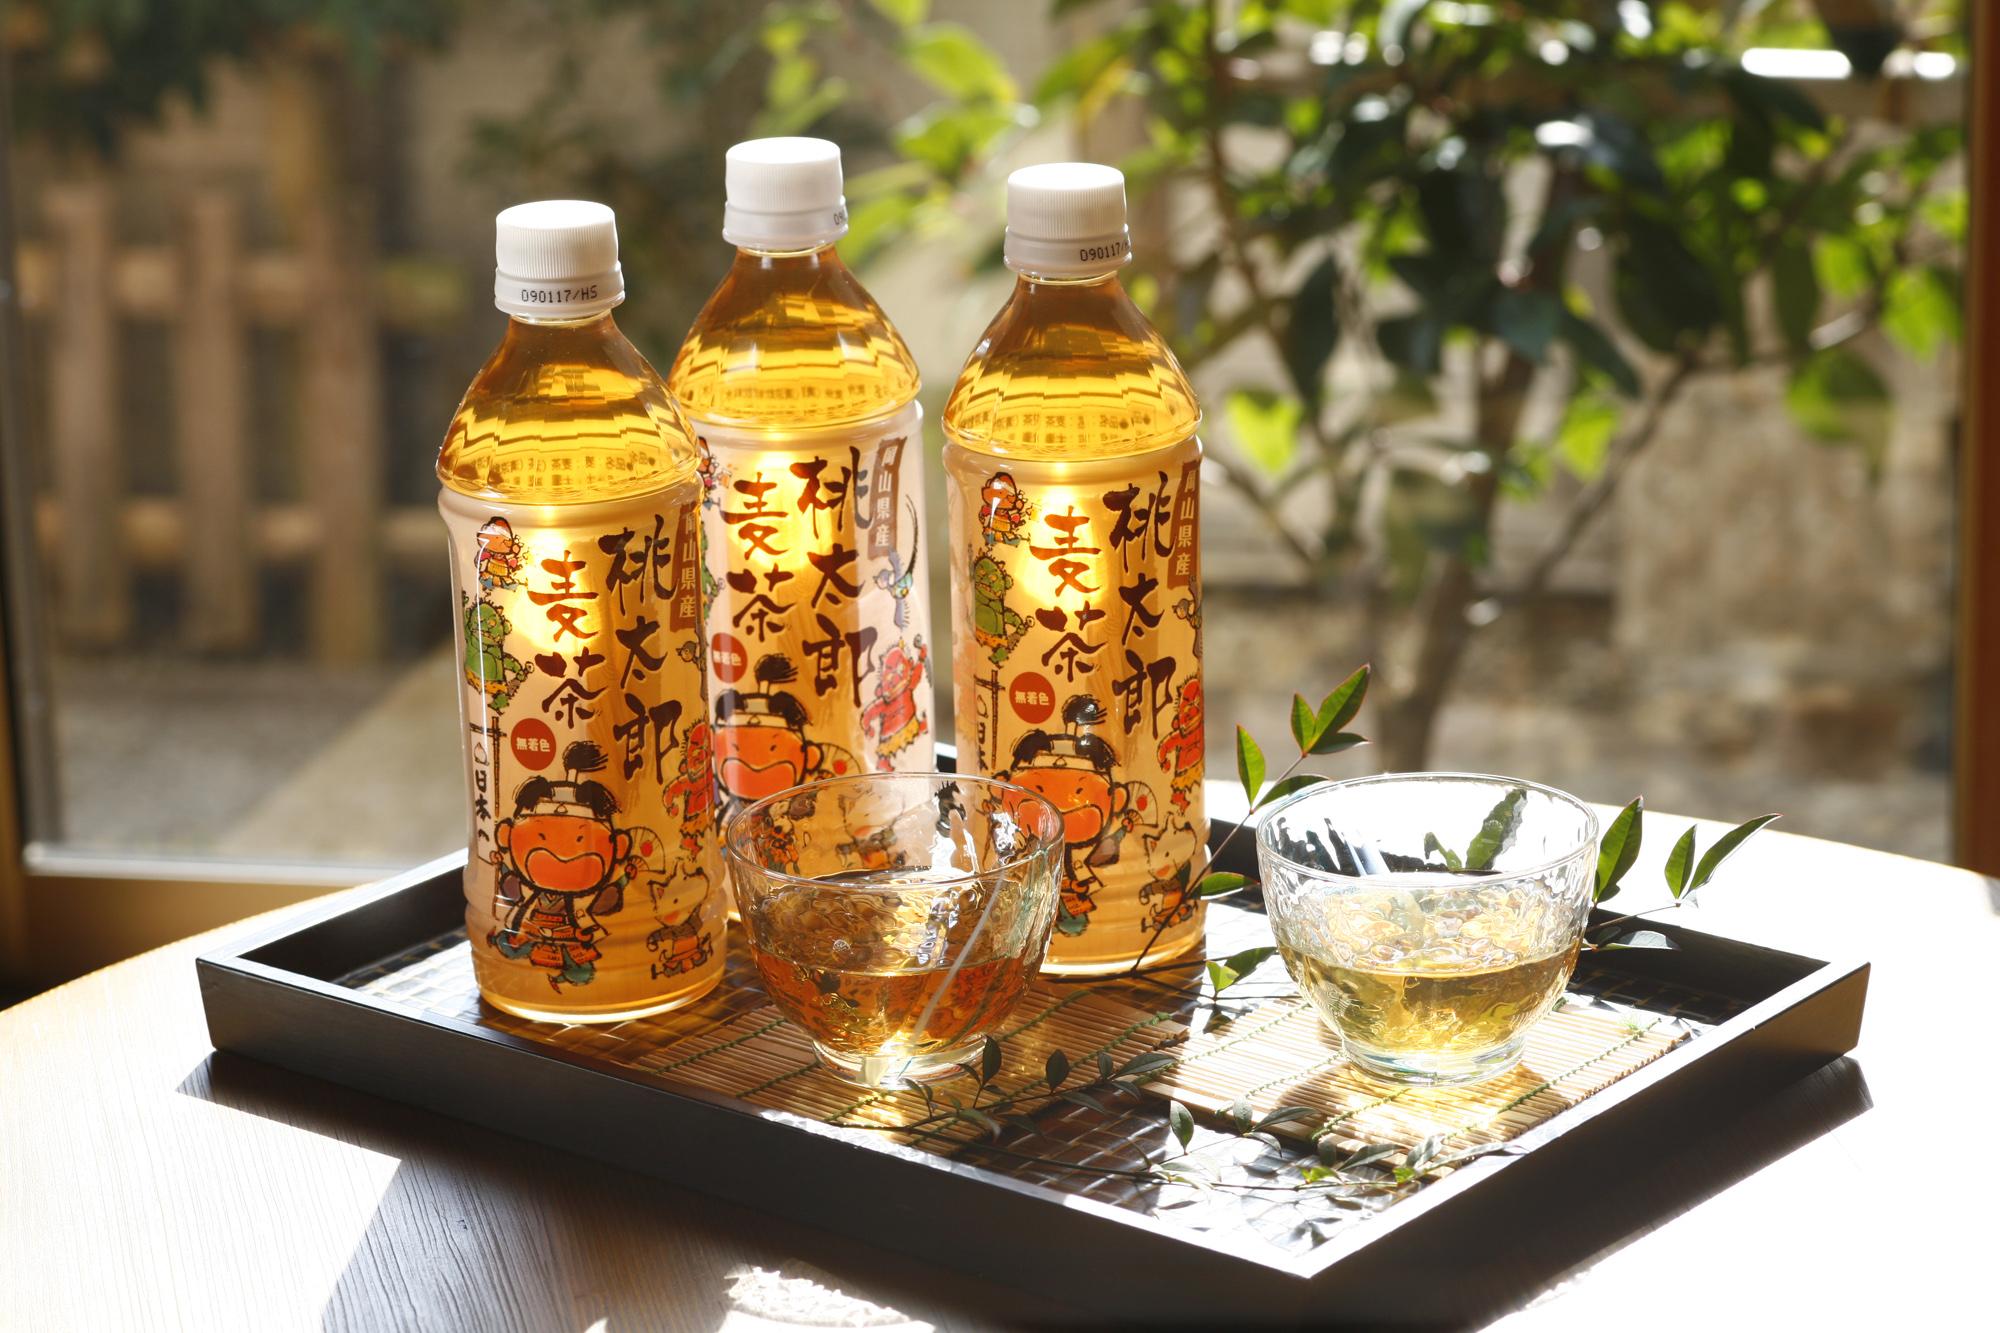 BU02 桃太郎麦茶500ml×24本